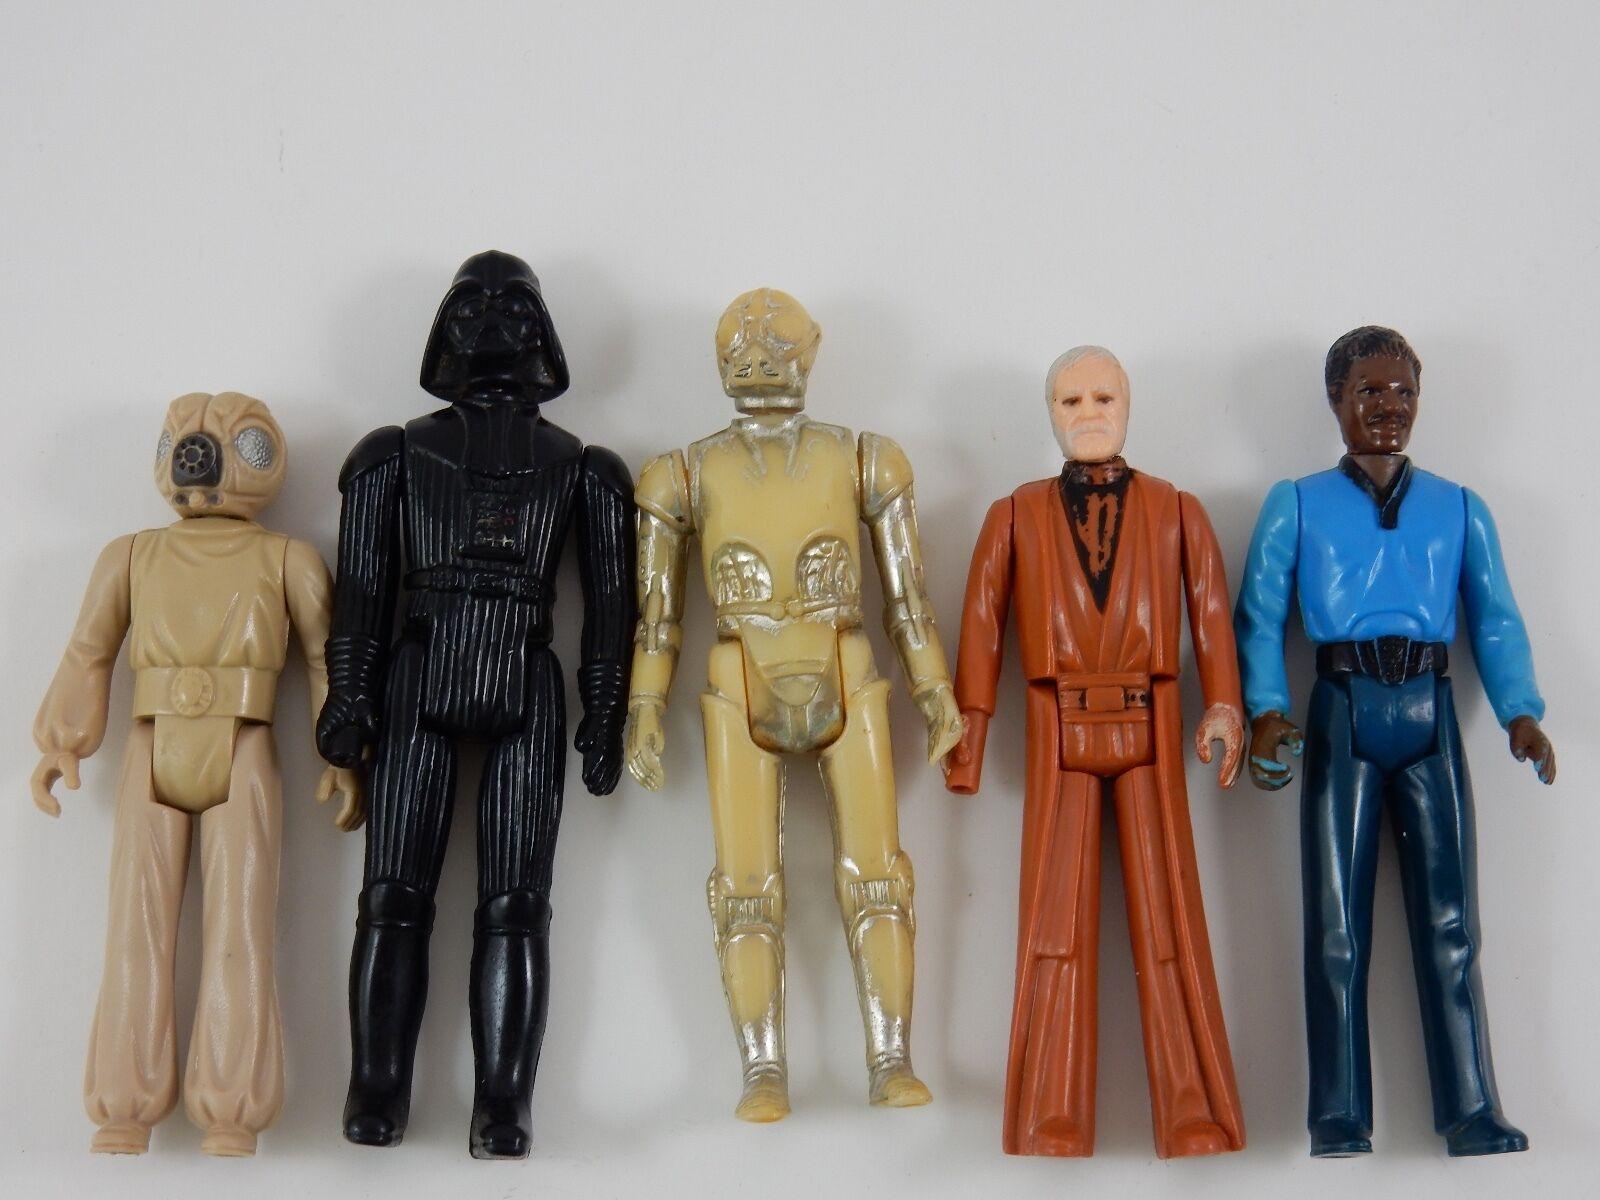 Star Wars 1977-1981 Loose Action Figures